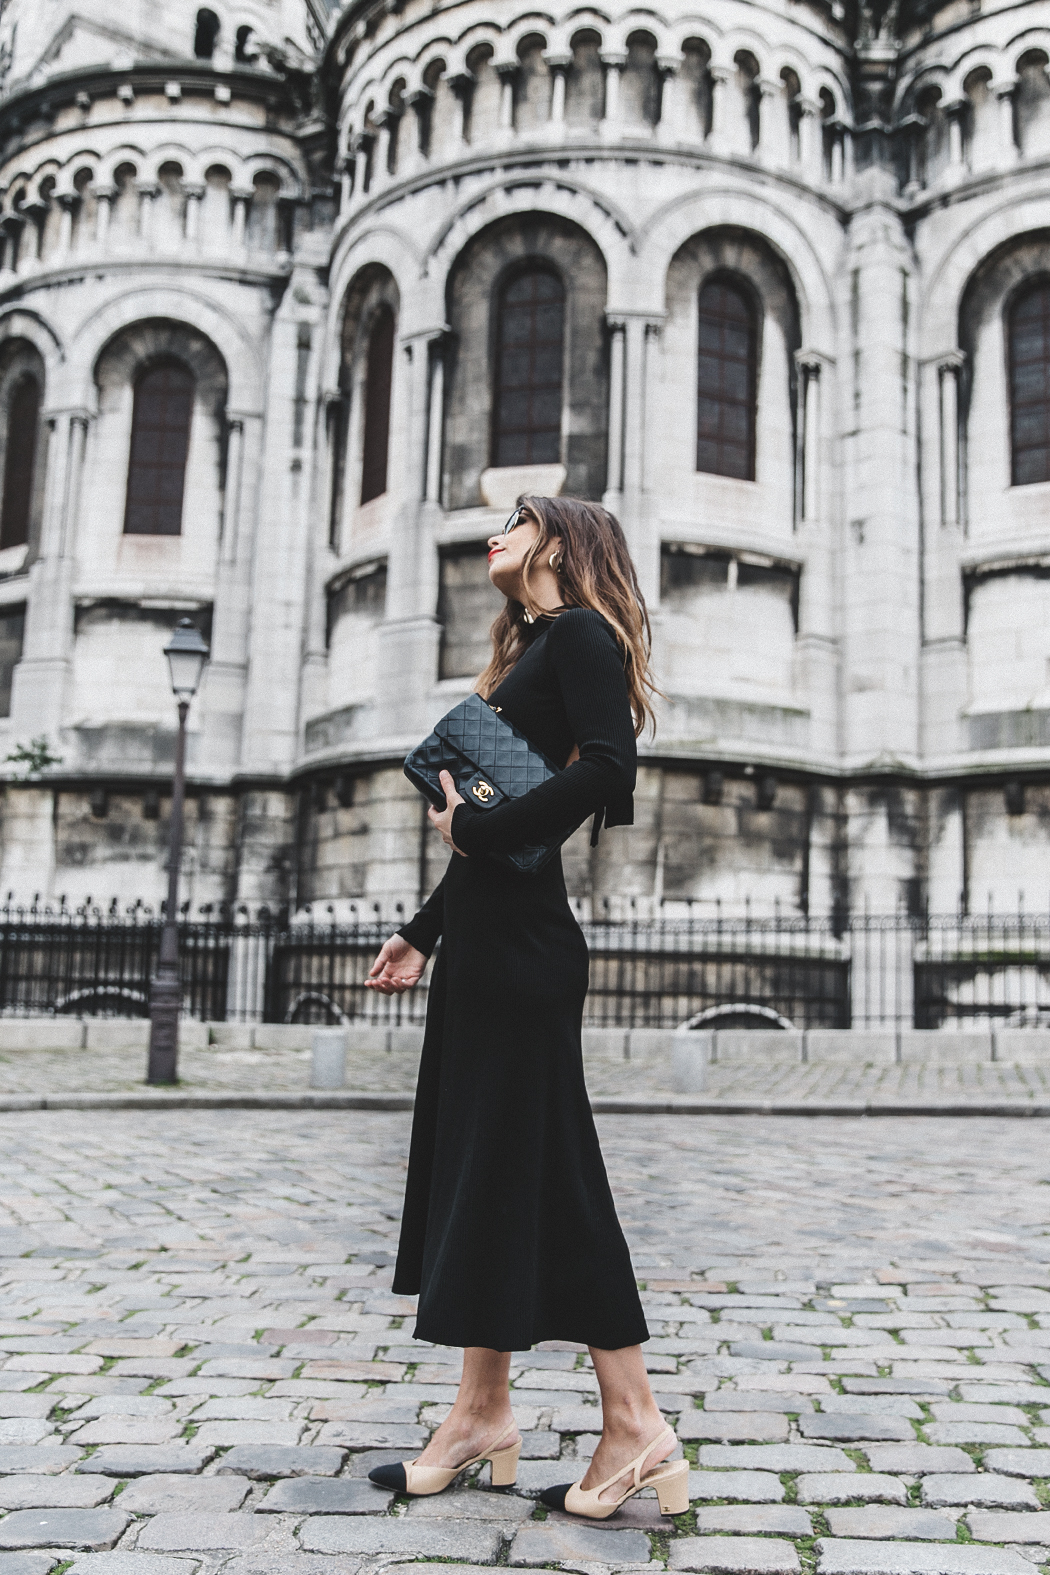 Backless_Dress-Black_Dress-Chanel_Shoes-Paris-PFW-Paris_Fashion_Week_Fall_2016-31